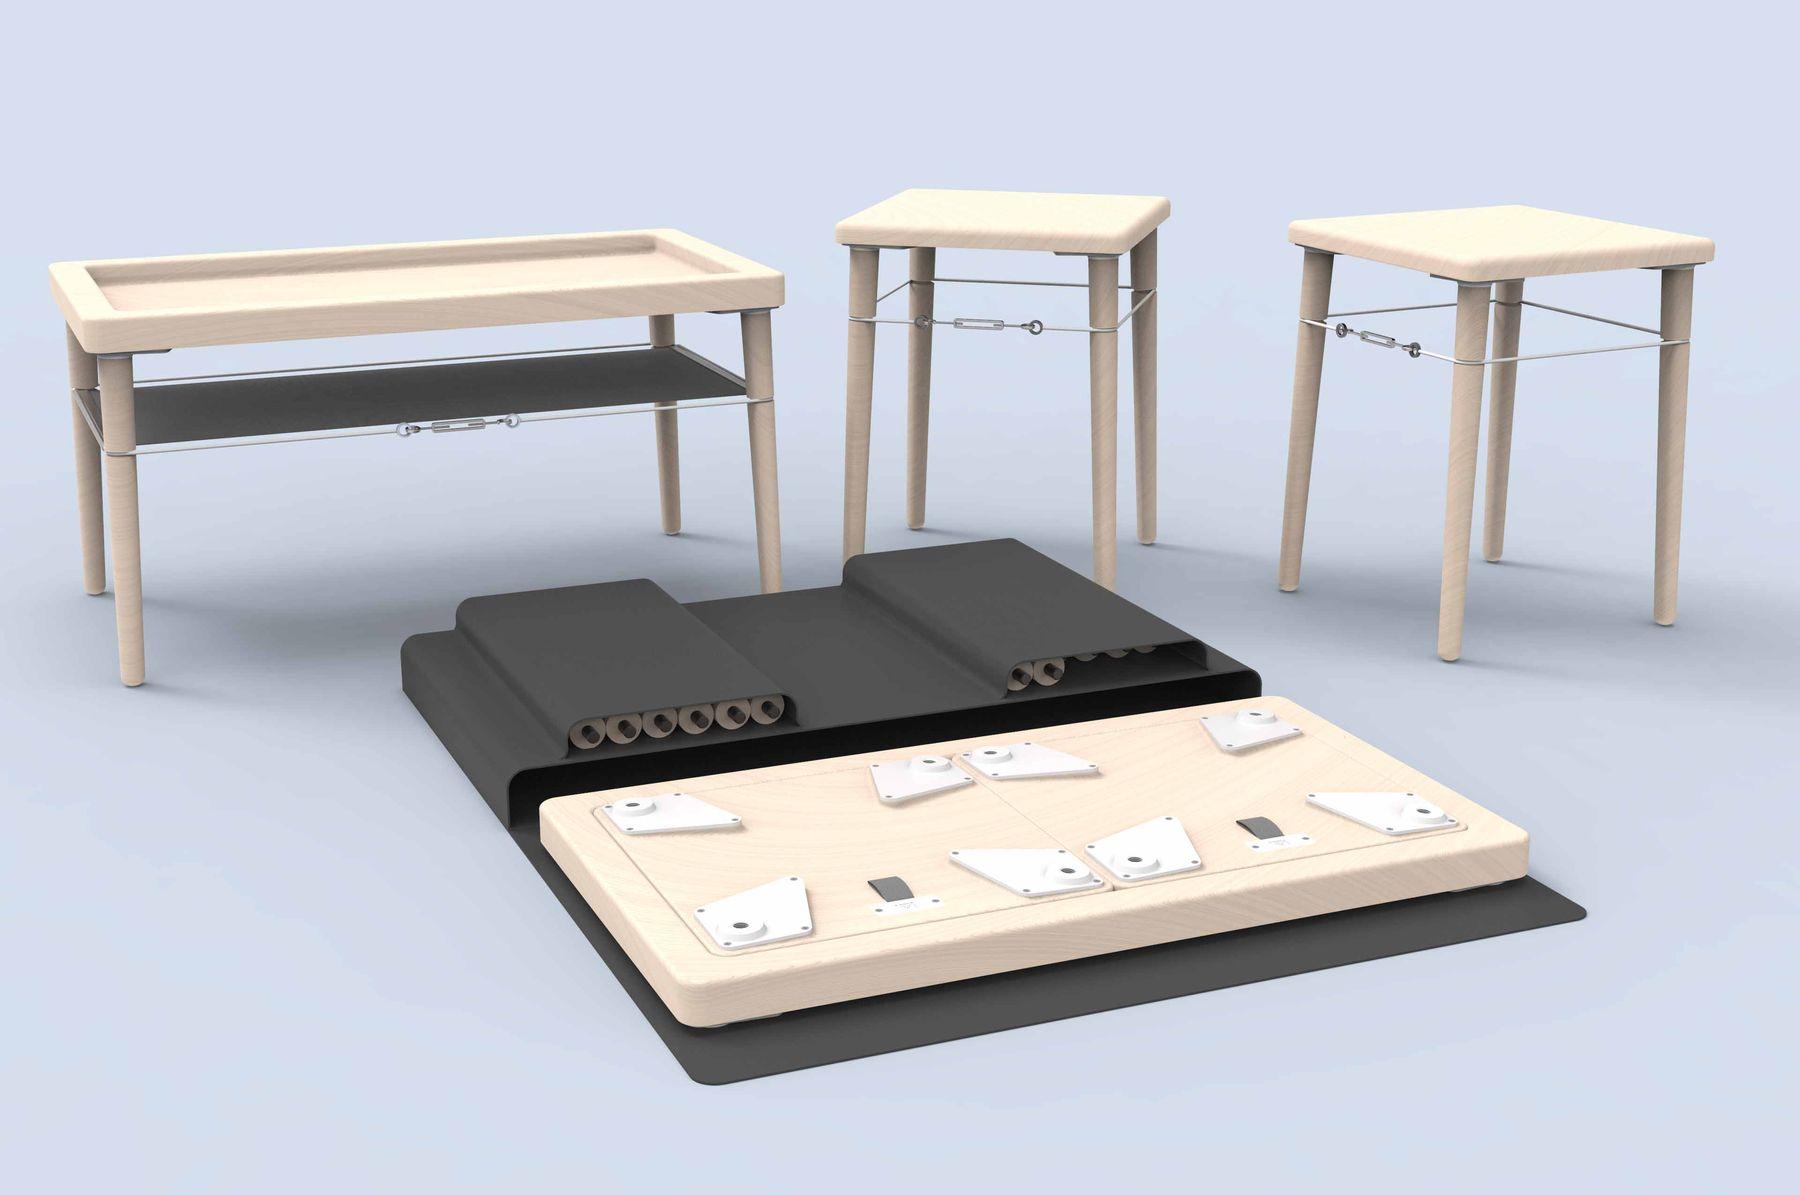 Kit Furniture Set, James Elliott, Ba (Hons) Product Design, 2019